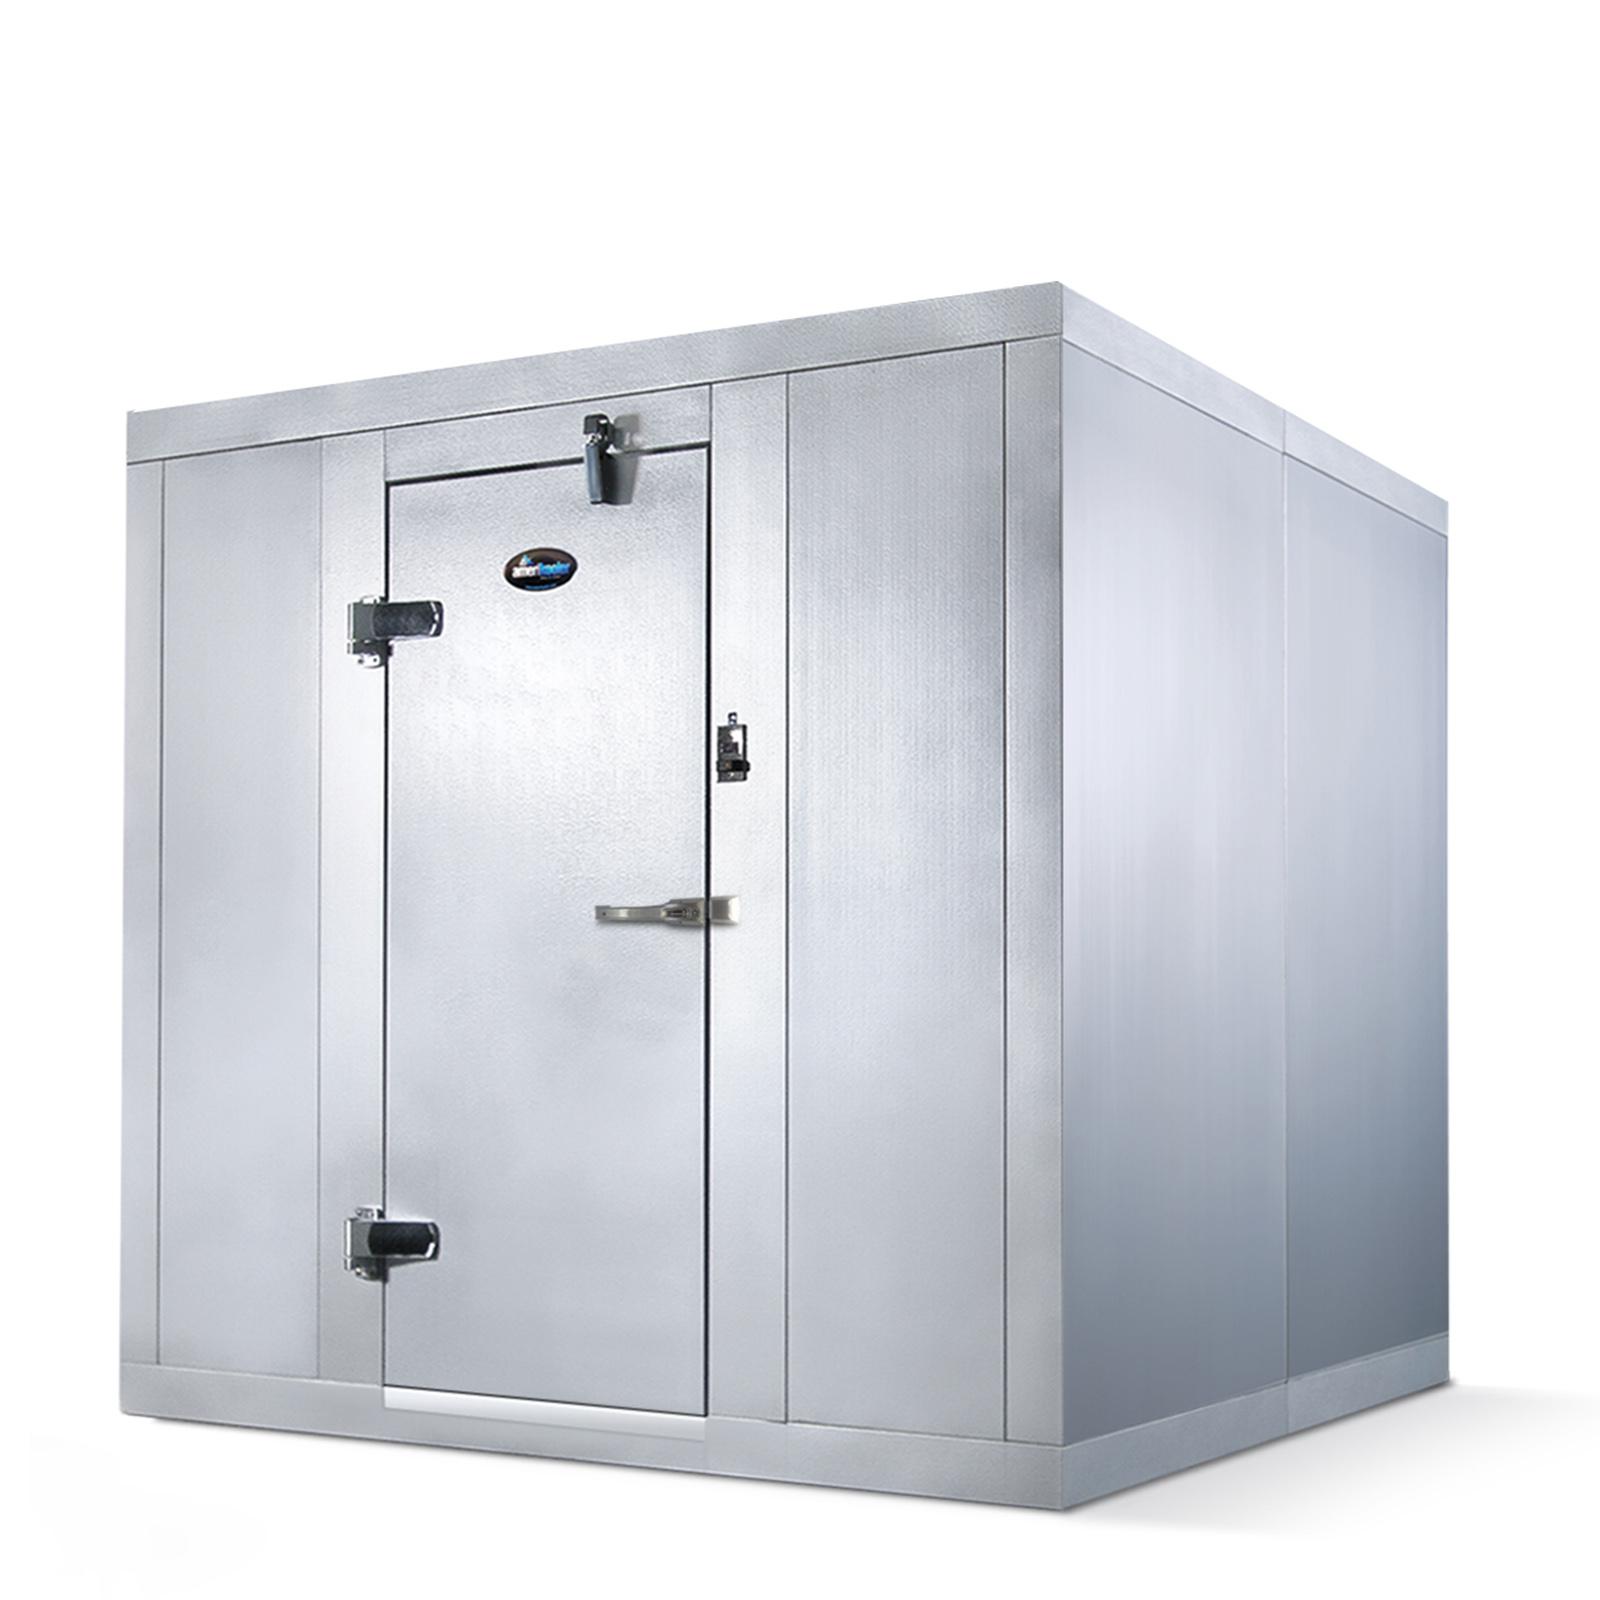 AmeriKooler DC081072**NBRC-O walk in cooler, modular, remote